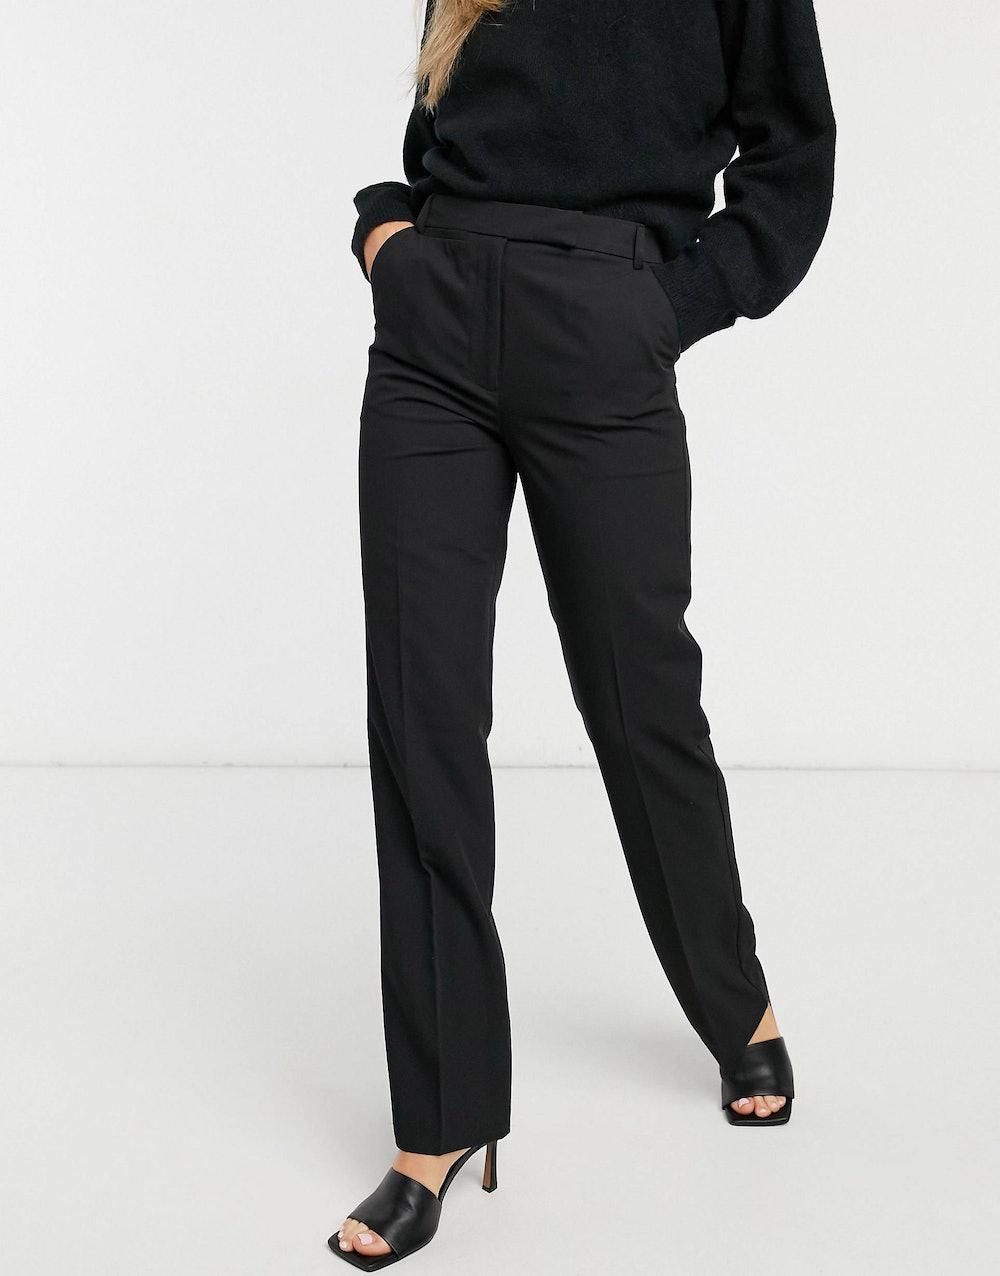 tailored straight leg pants in black